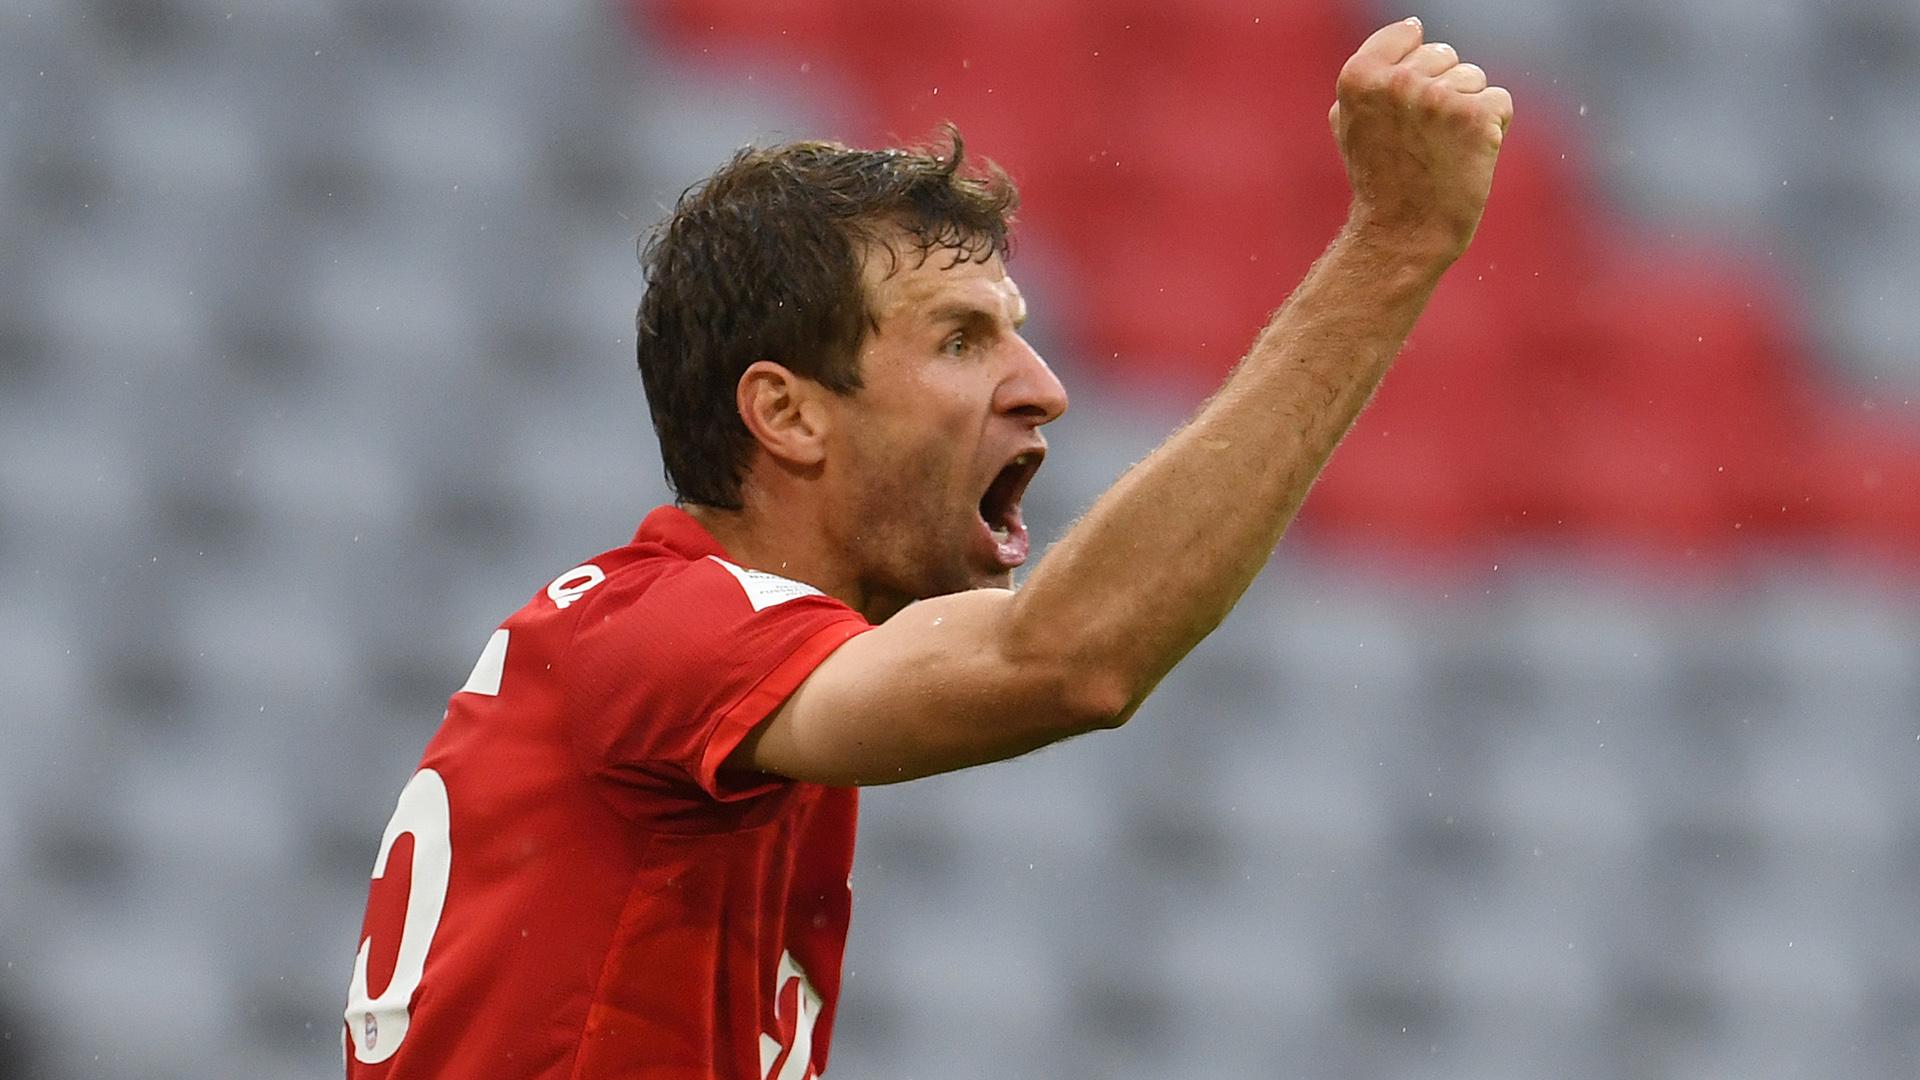 Muller matches De Bruyne's Bundesliga assist mark as Sancho closes ...